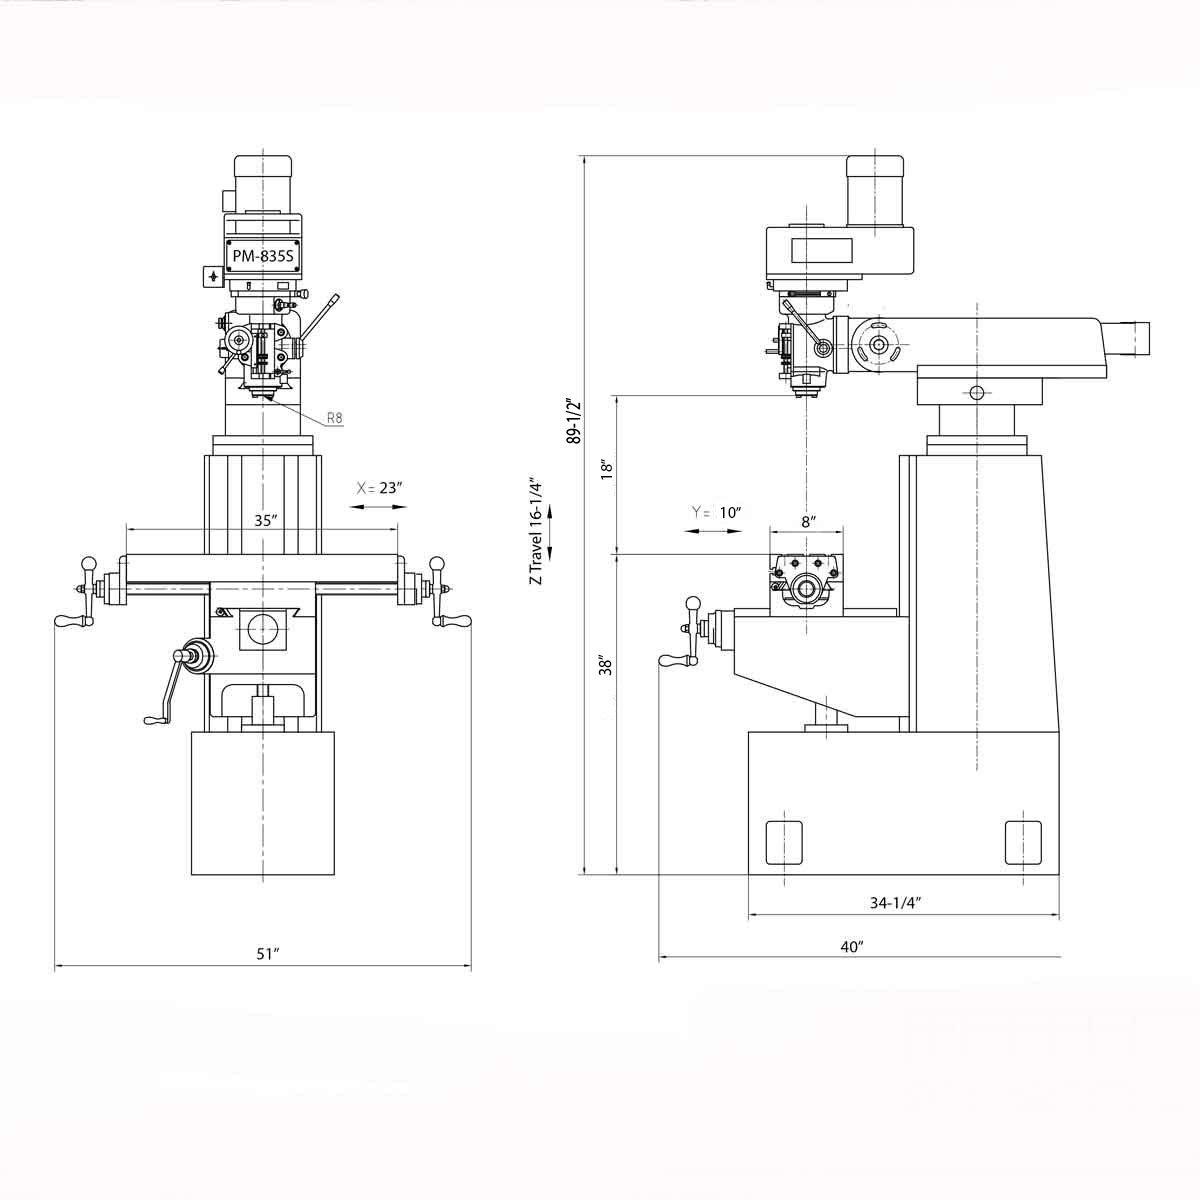 Bridgeport Milling Machine Wiring Diagram Bridgeport Power